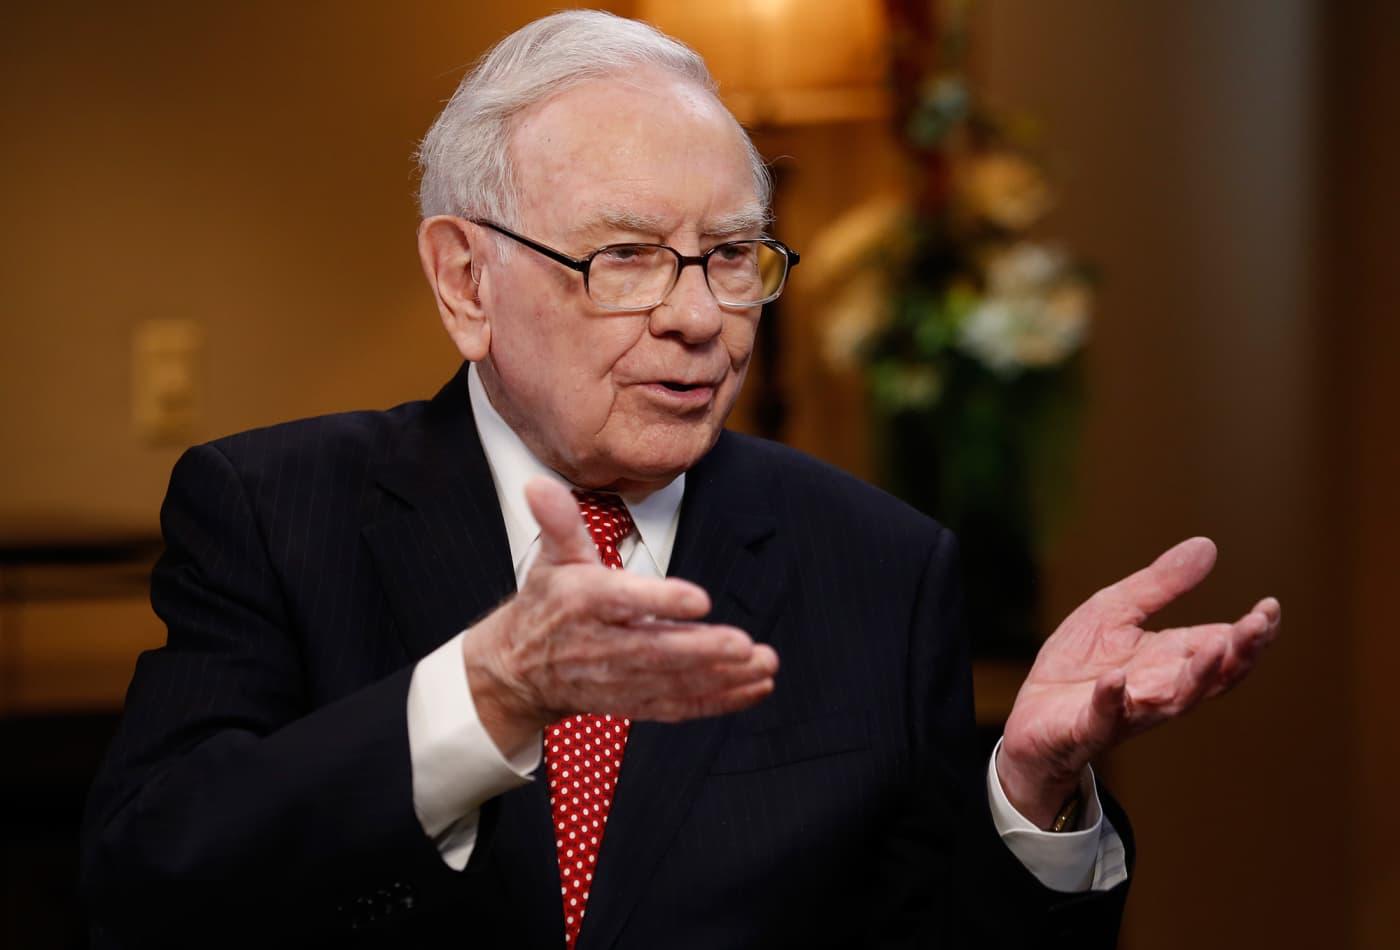 Warren Buffett and Mark Cuban agree: Avoid debt at all costs